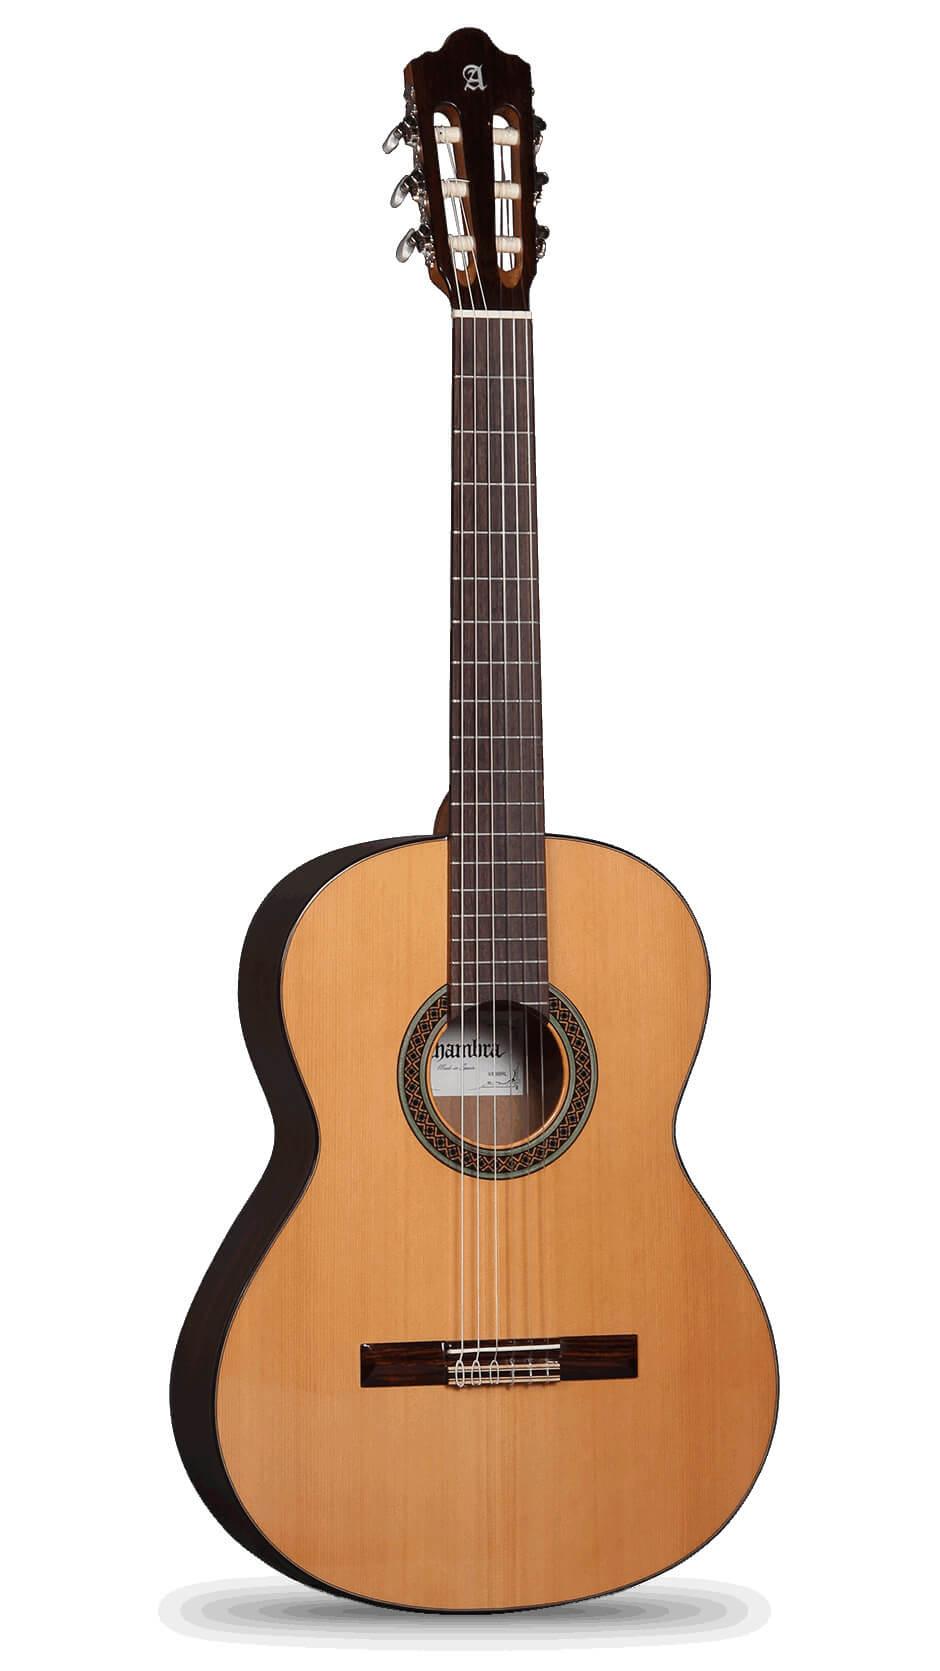 Guitarra Clásica Alhambra 3C Serie S